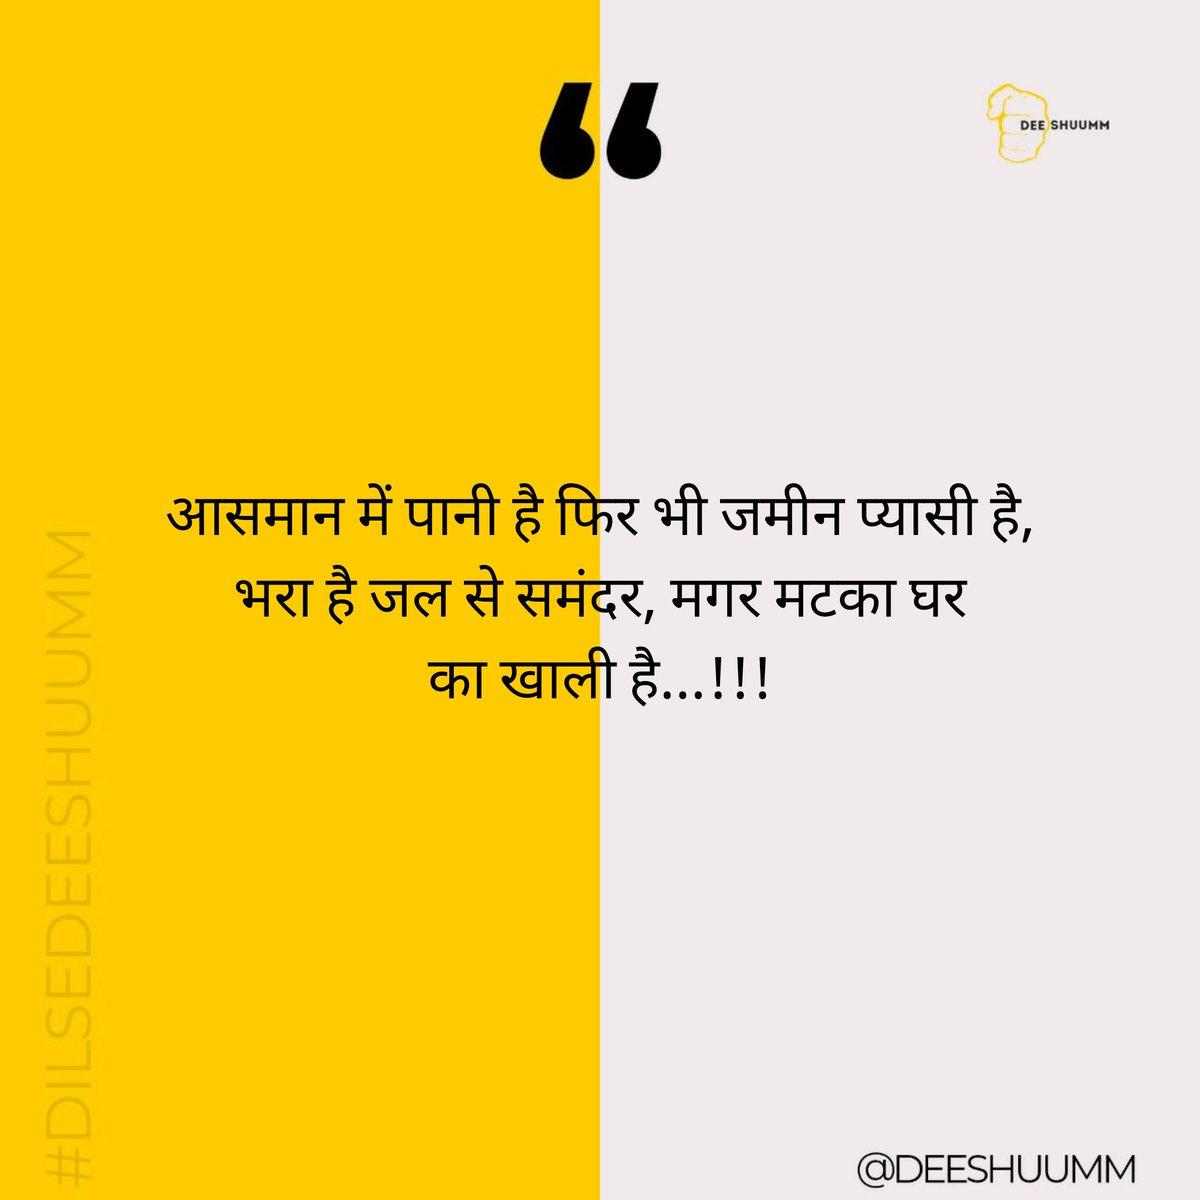 if you feel Connected RT Now! #shayari #love #poetry #urdu #urdupoetry #shayarilover #hindi #shayar #quotes #hindishayari #lovequotes #rekhta #follow #urdushayari #loveshayari #hindipoetry #ishq #poet #like  #shayri #poetrycommunity #instashayari #sad #poem #mohabbat #deeshuummpic.twitter.com/WDqIiYB3a9